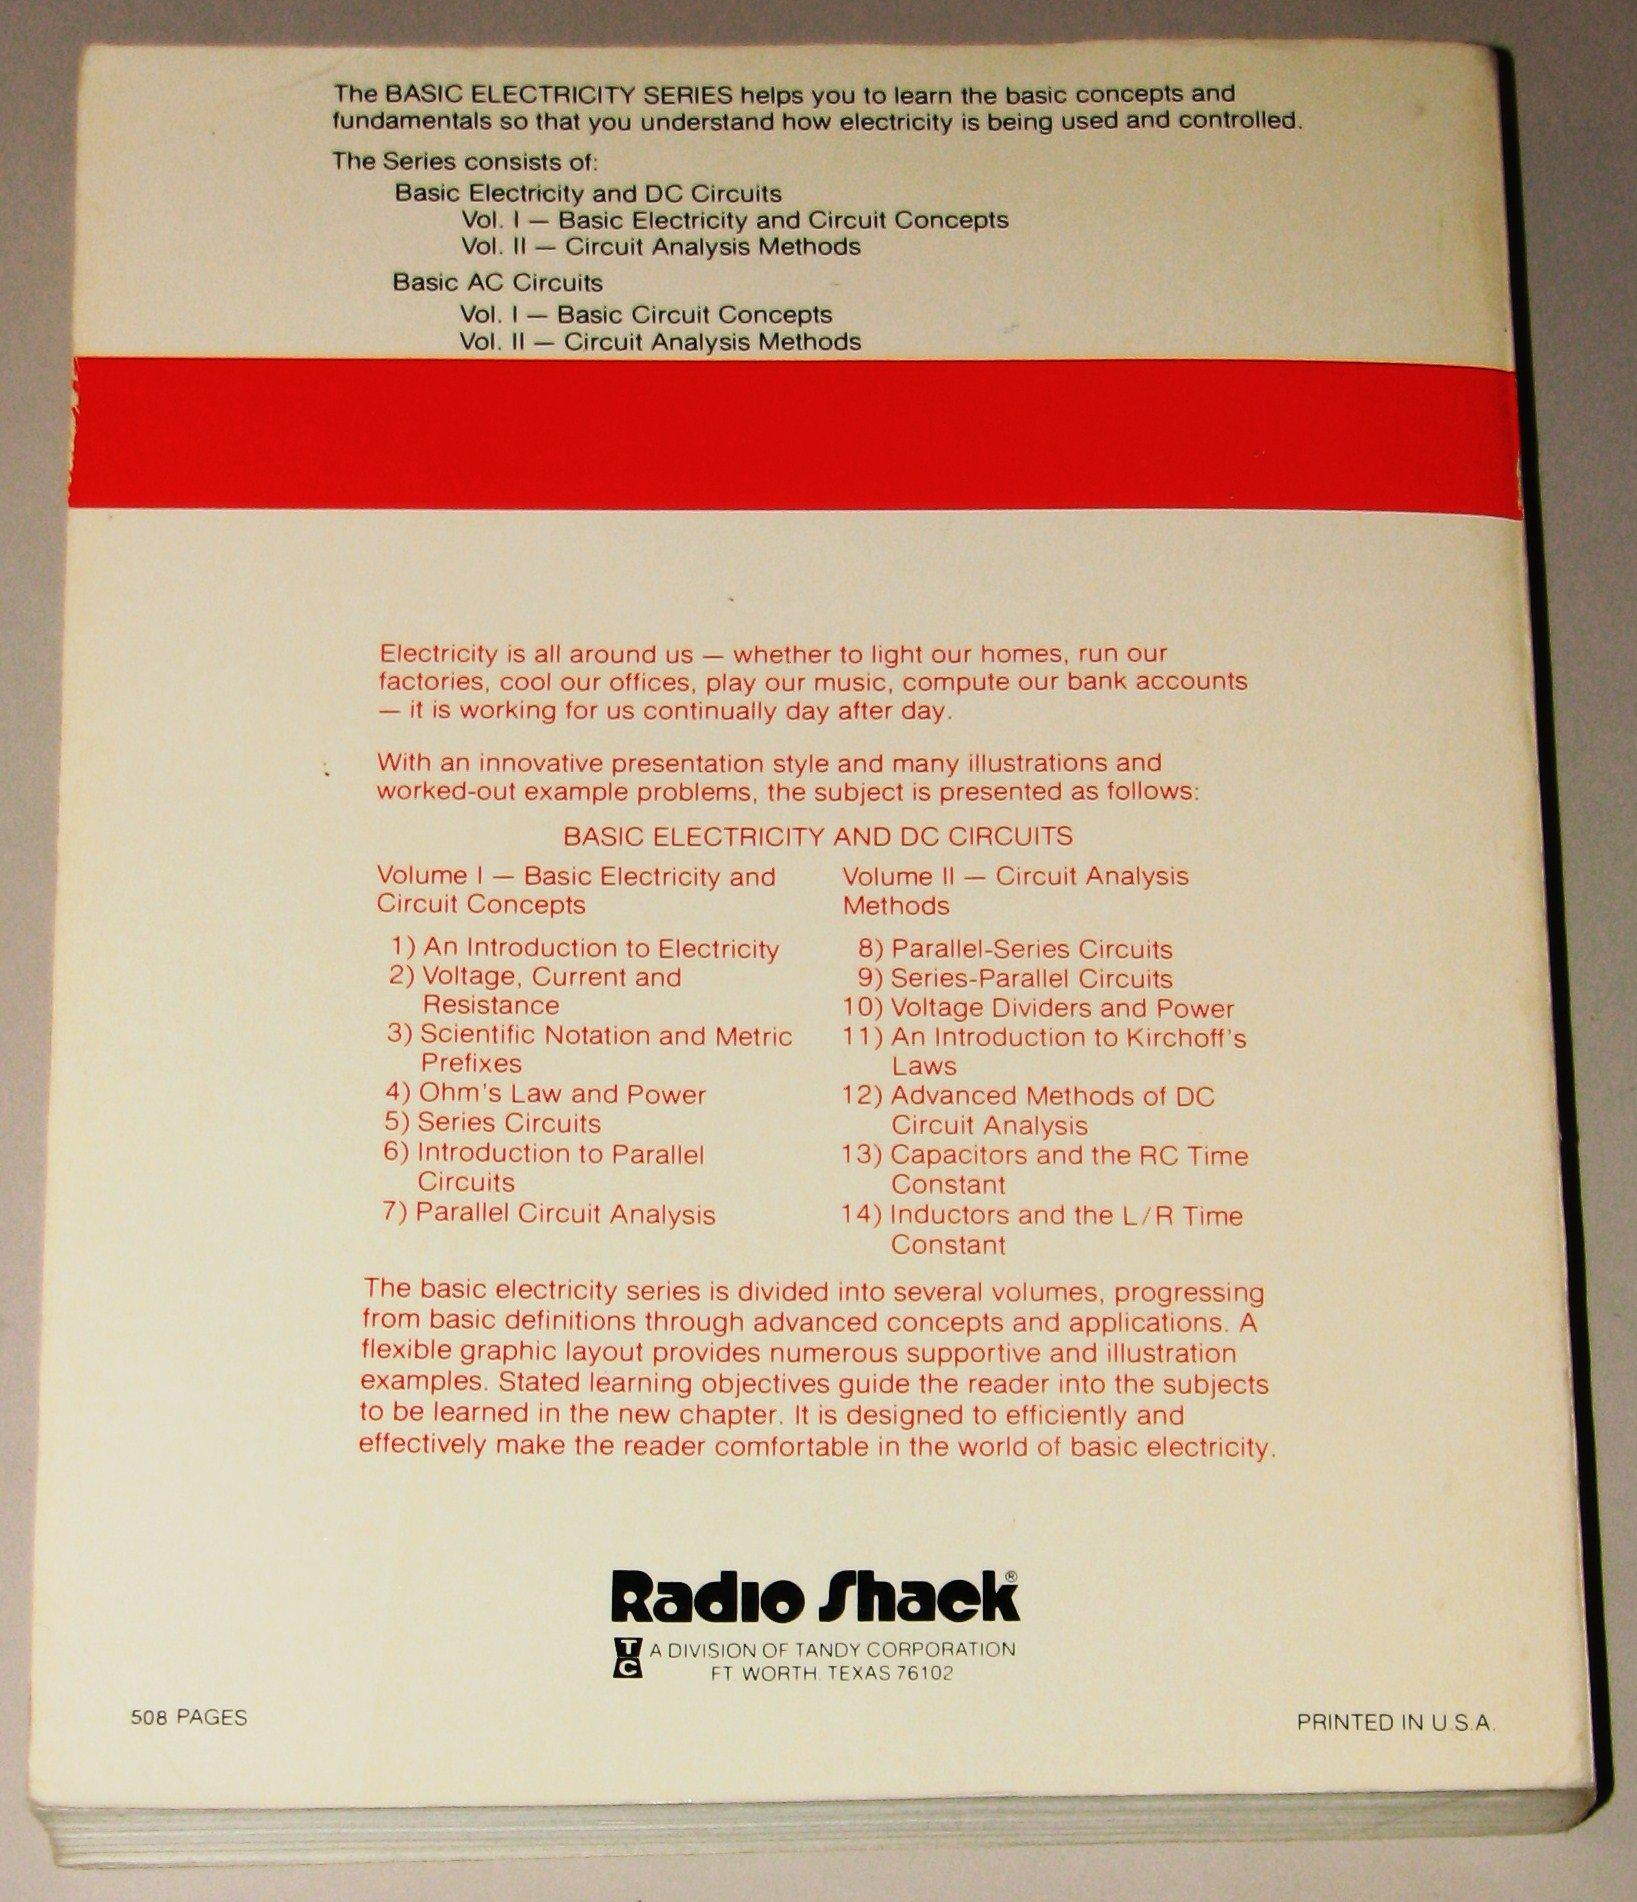 Dc Circuits Vol Ii Circuit Analysis Methods Ralpha Oliva Amazon Examples Resistors In Series And Parallel Resistor Books